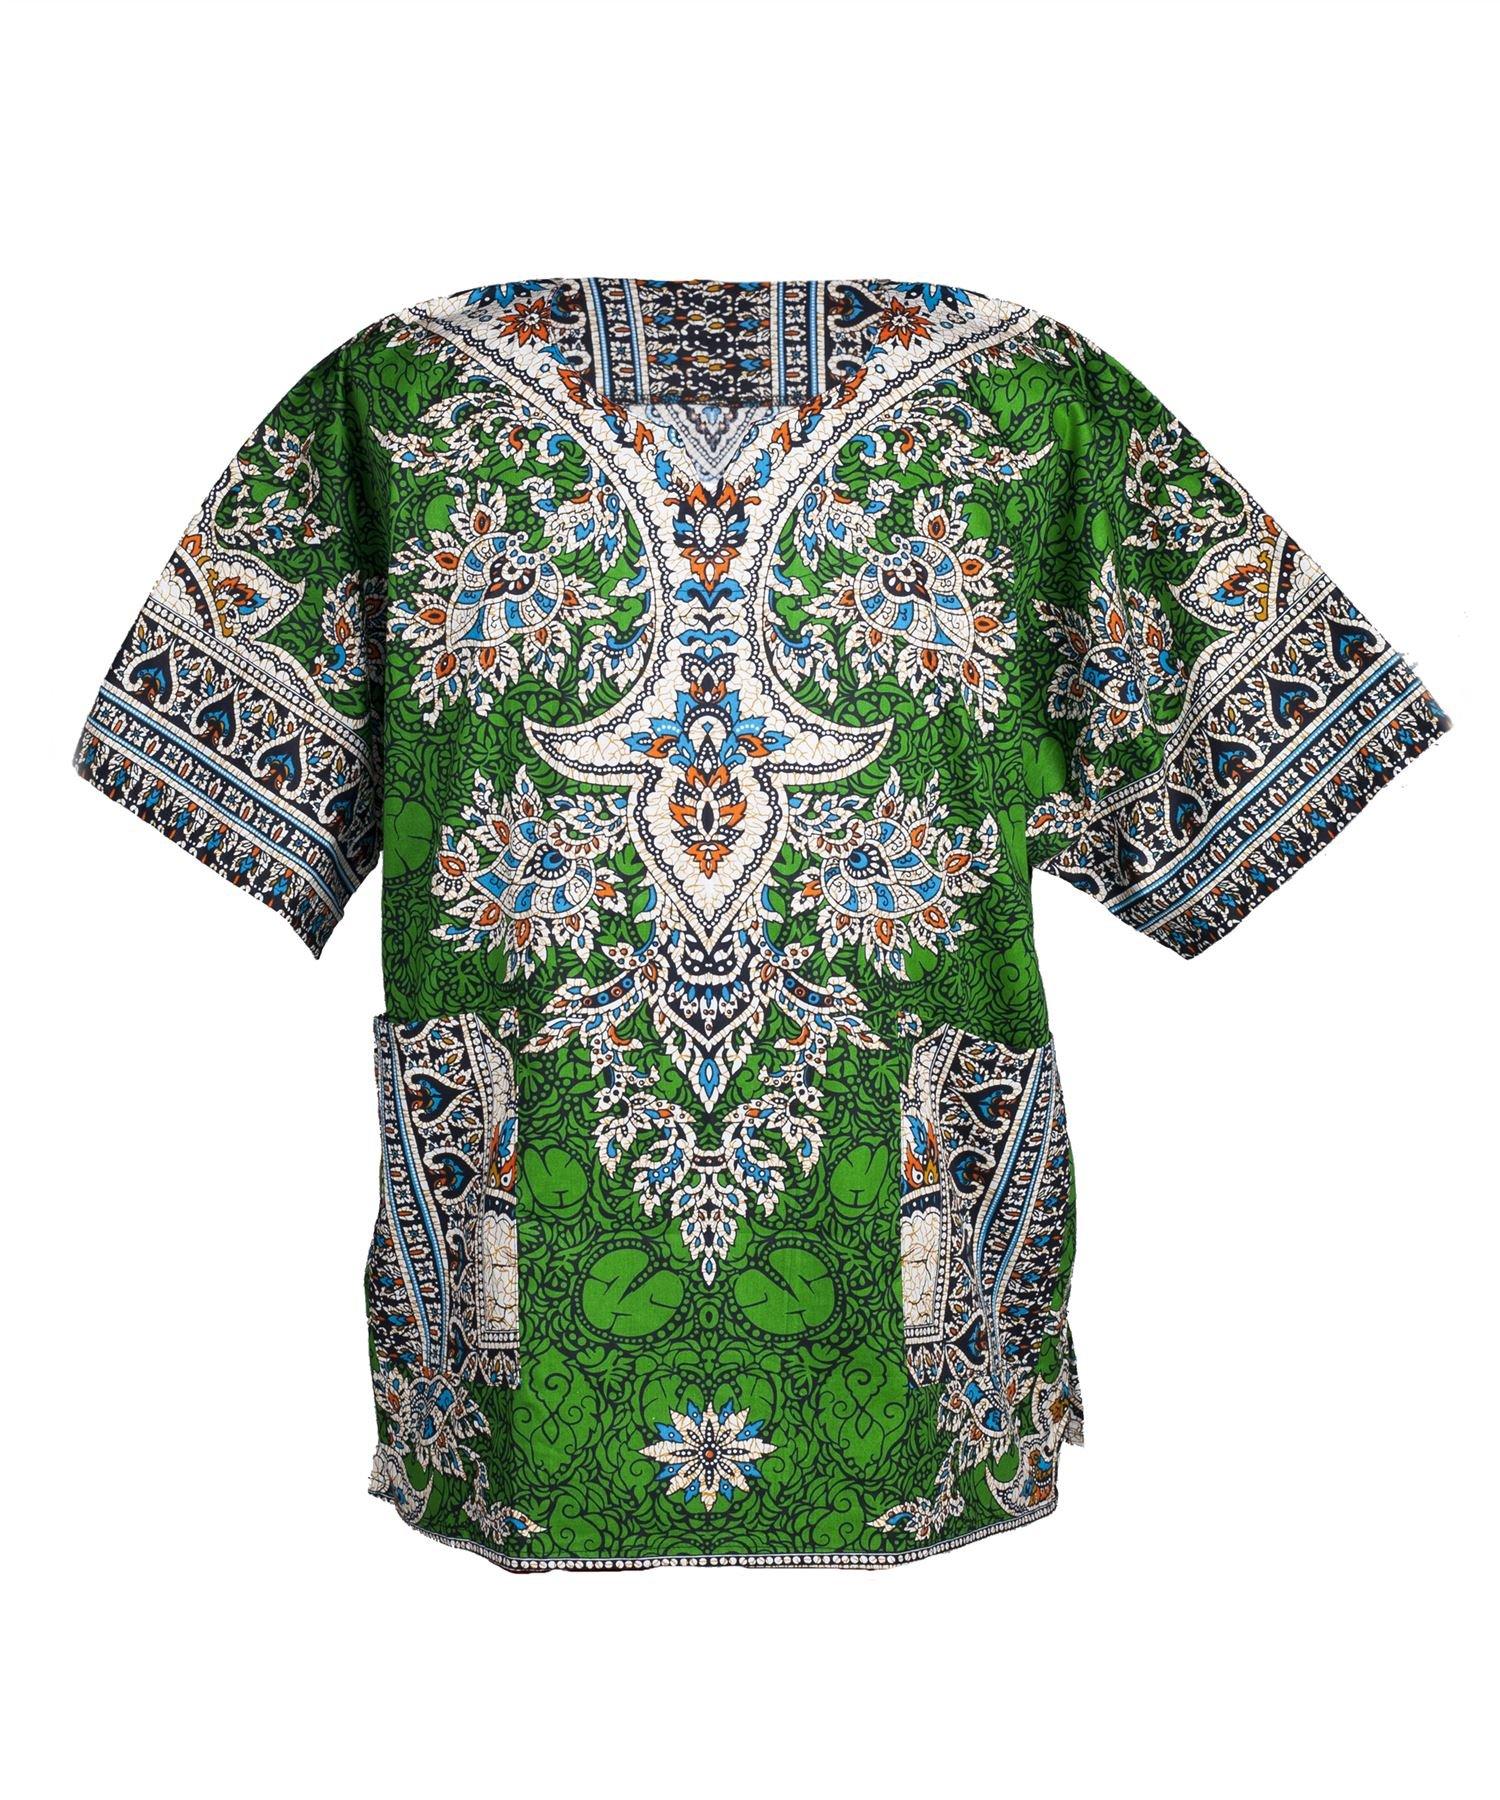 Lofbaz Traditional African Print Unisex Dashiki Ethnic Size XS Green by Lofbaz